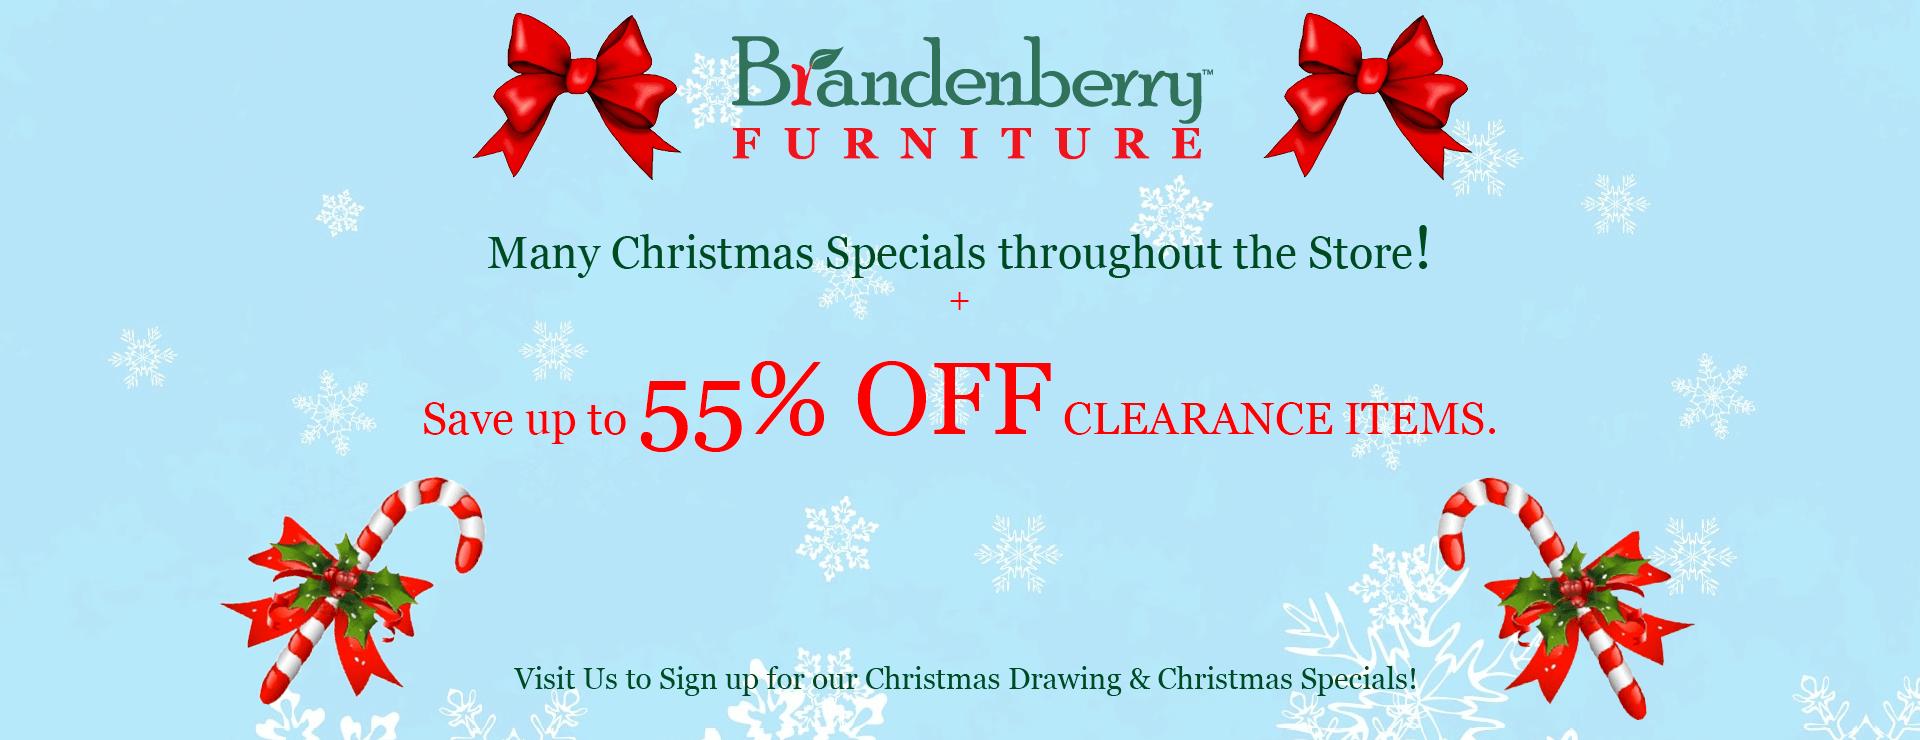 Brandenberry Christmas Sale